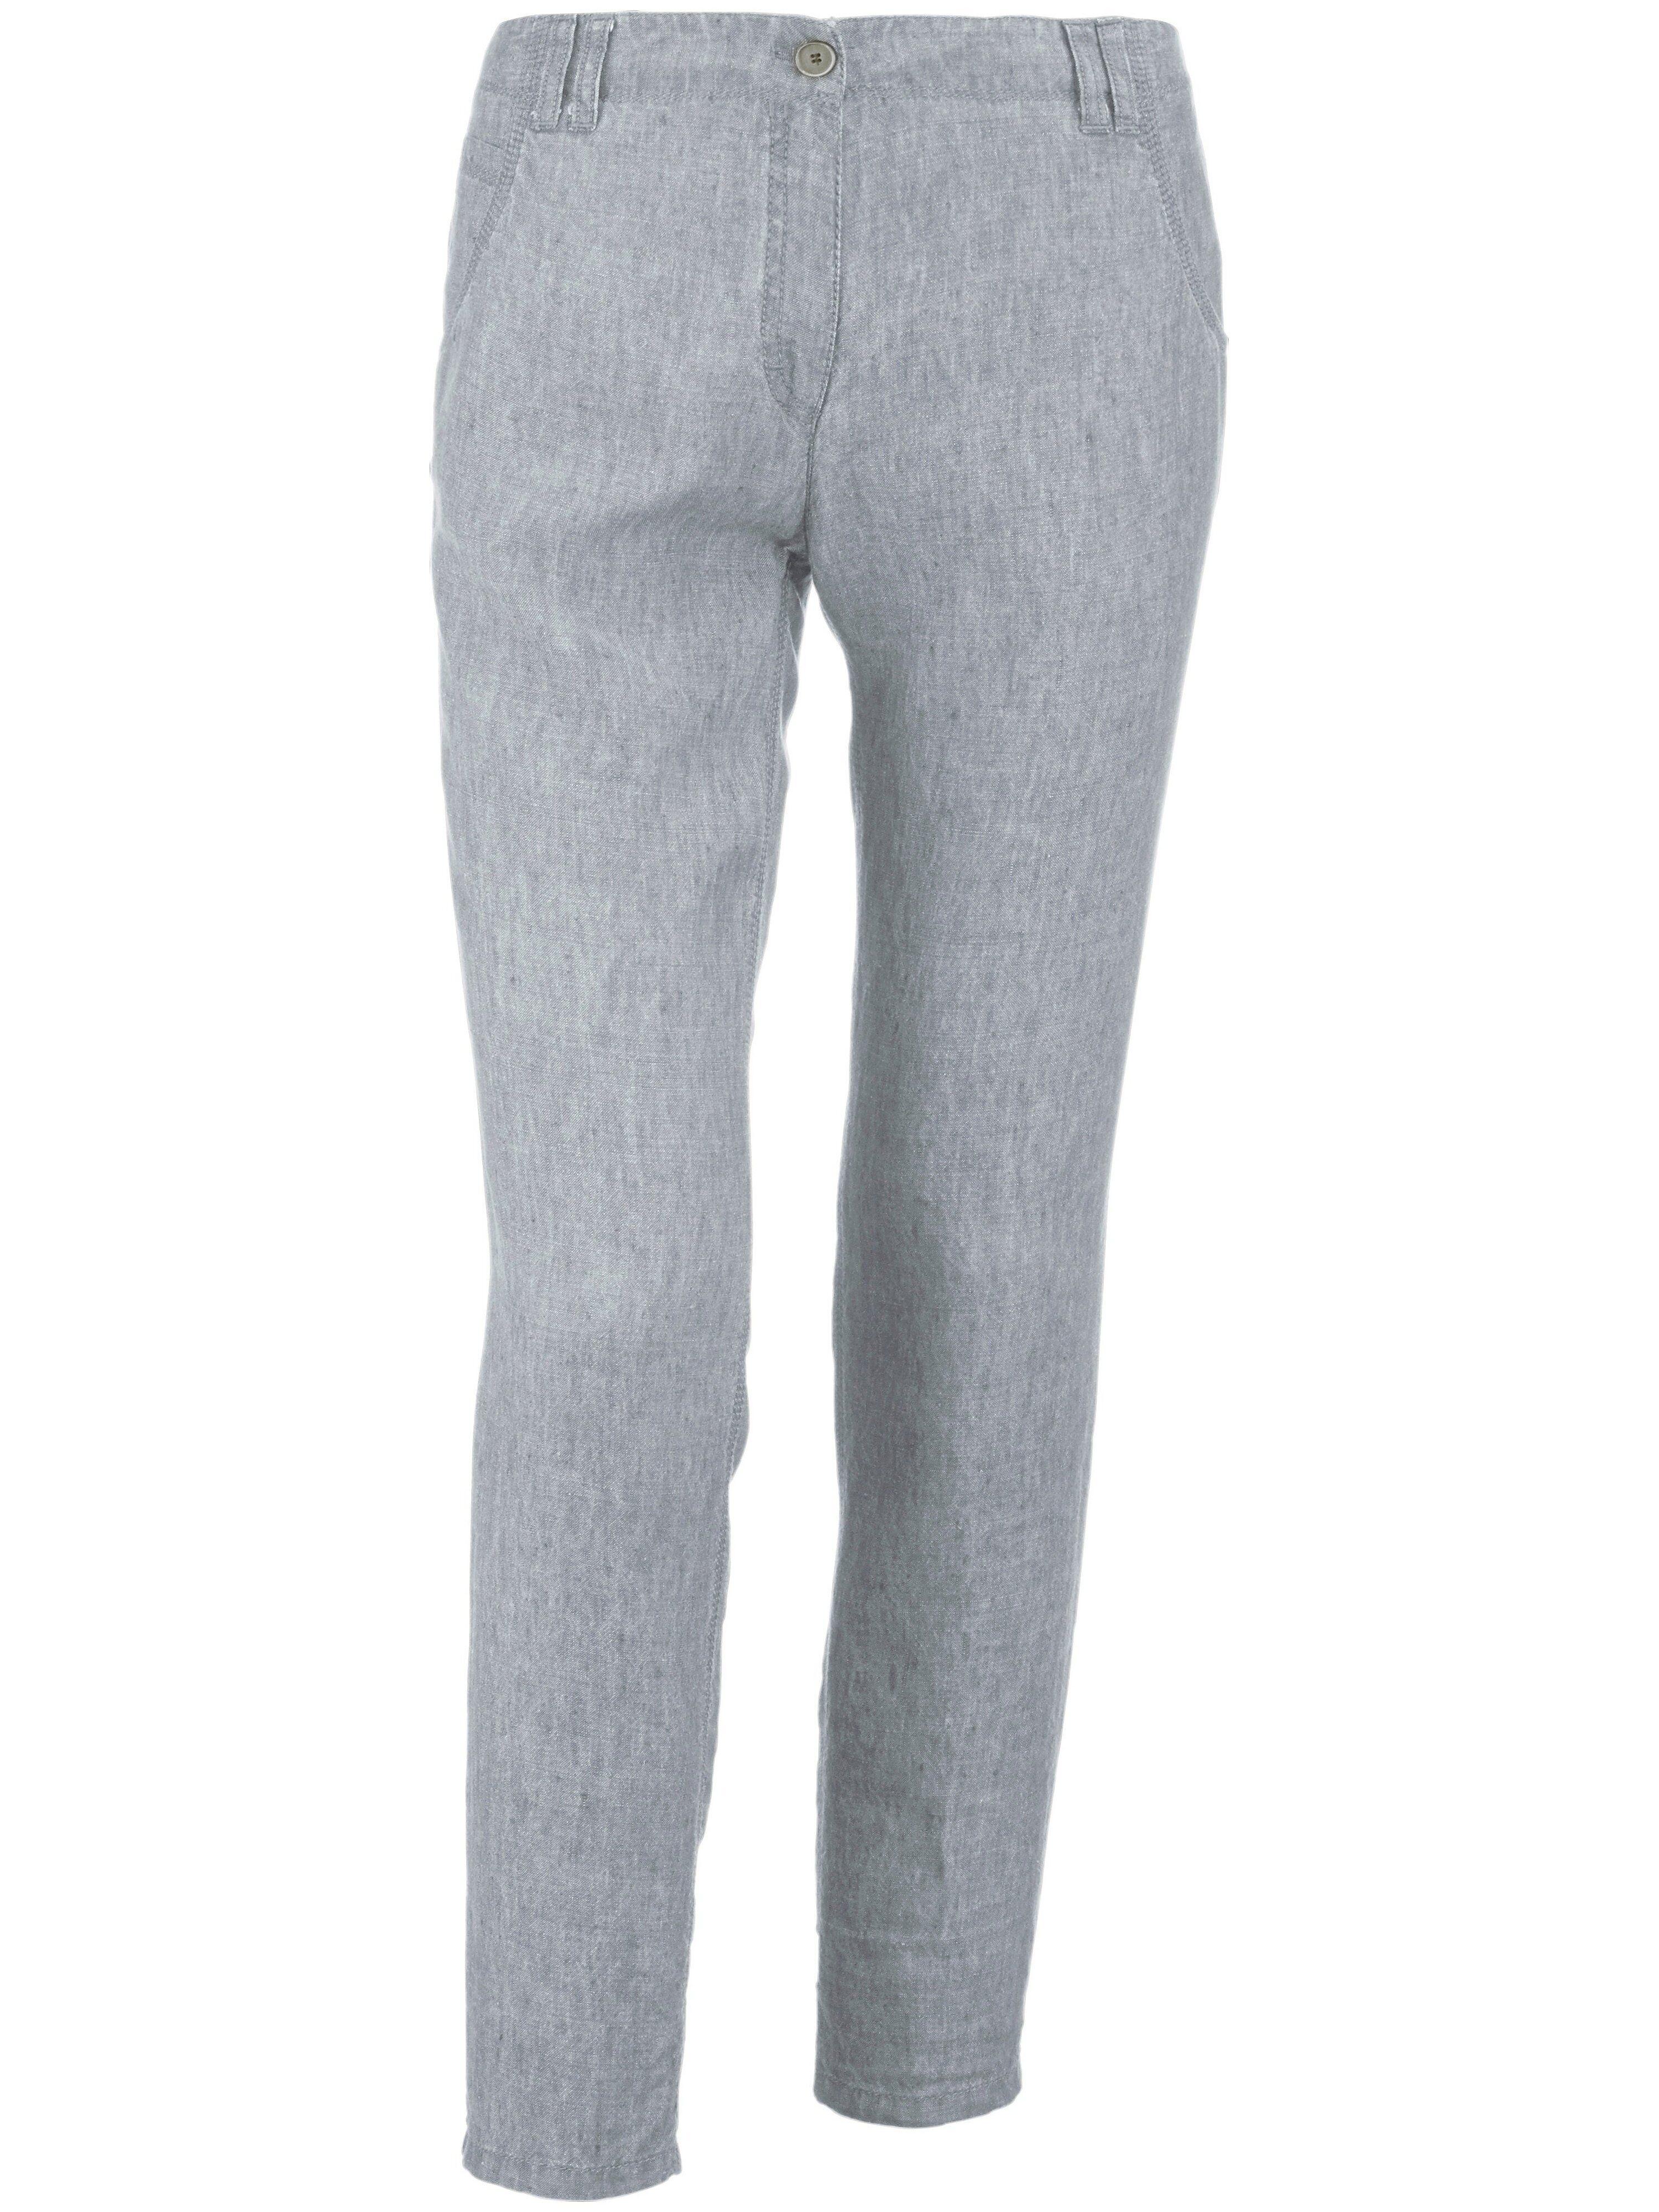 Brax Le pantalon 100% lin modèle Melo  Brax Feel Good gris  - Femme - 38